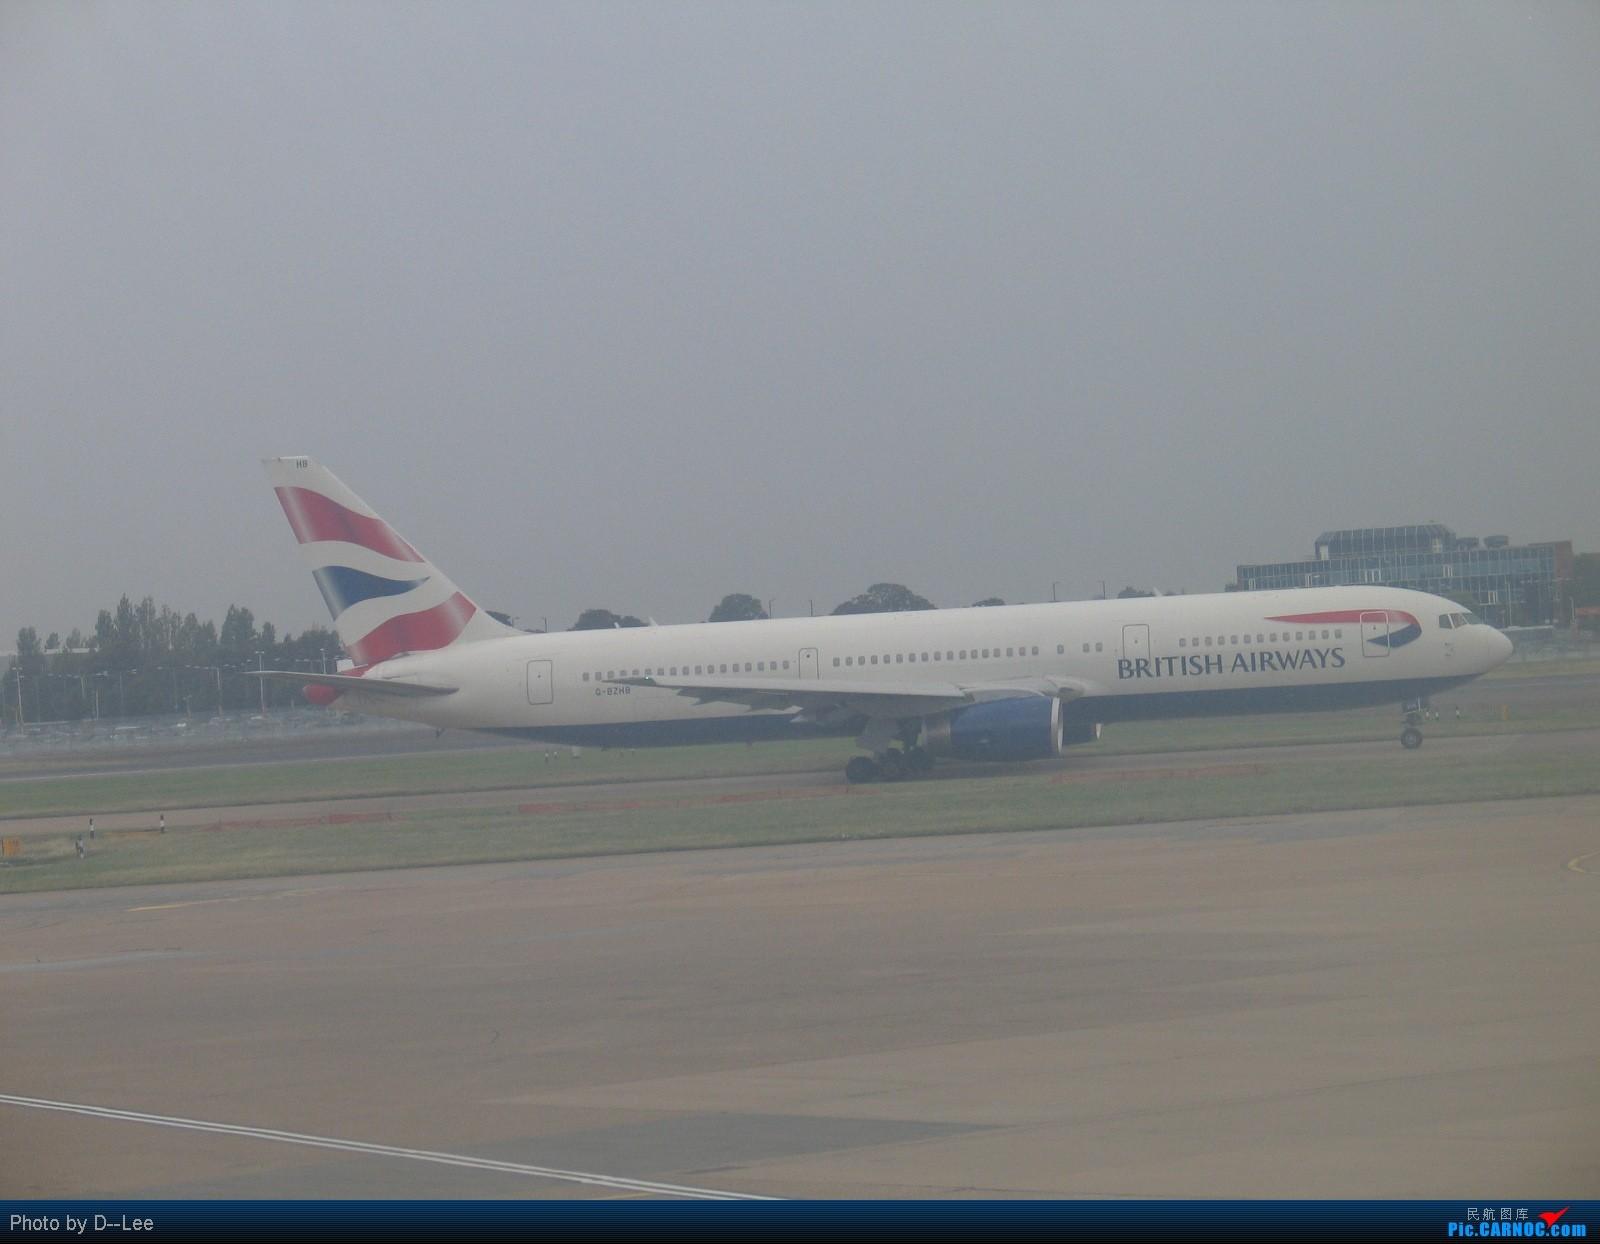 Re:[原创]新年来请大家吃些陈年老味,新年快乐啊各位 BOEING 767-300 B- Great Britain (UK) LONDON HEATHROW